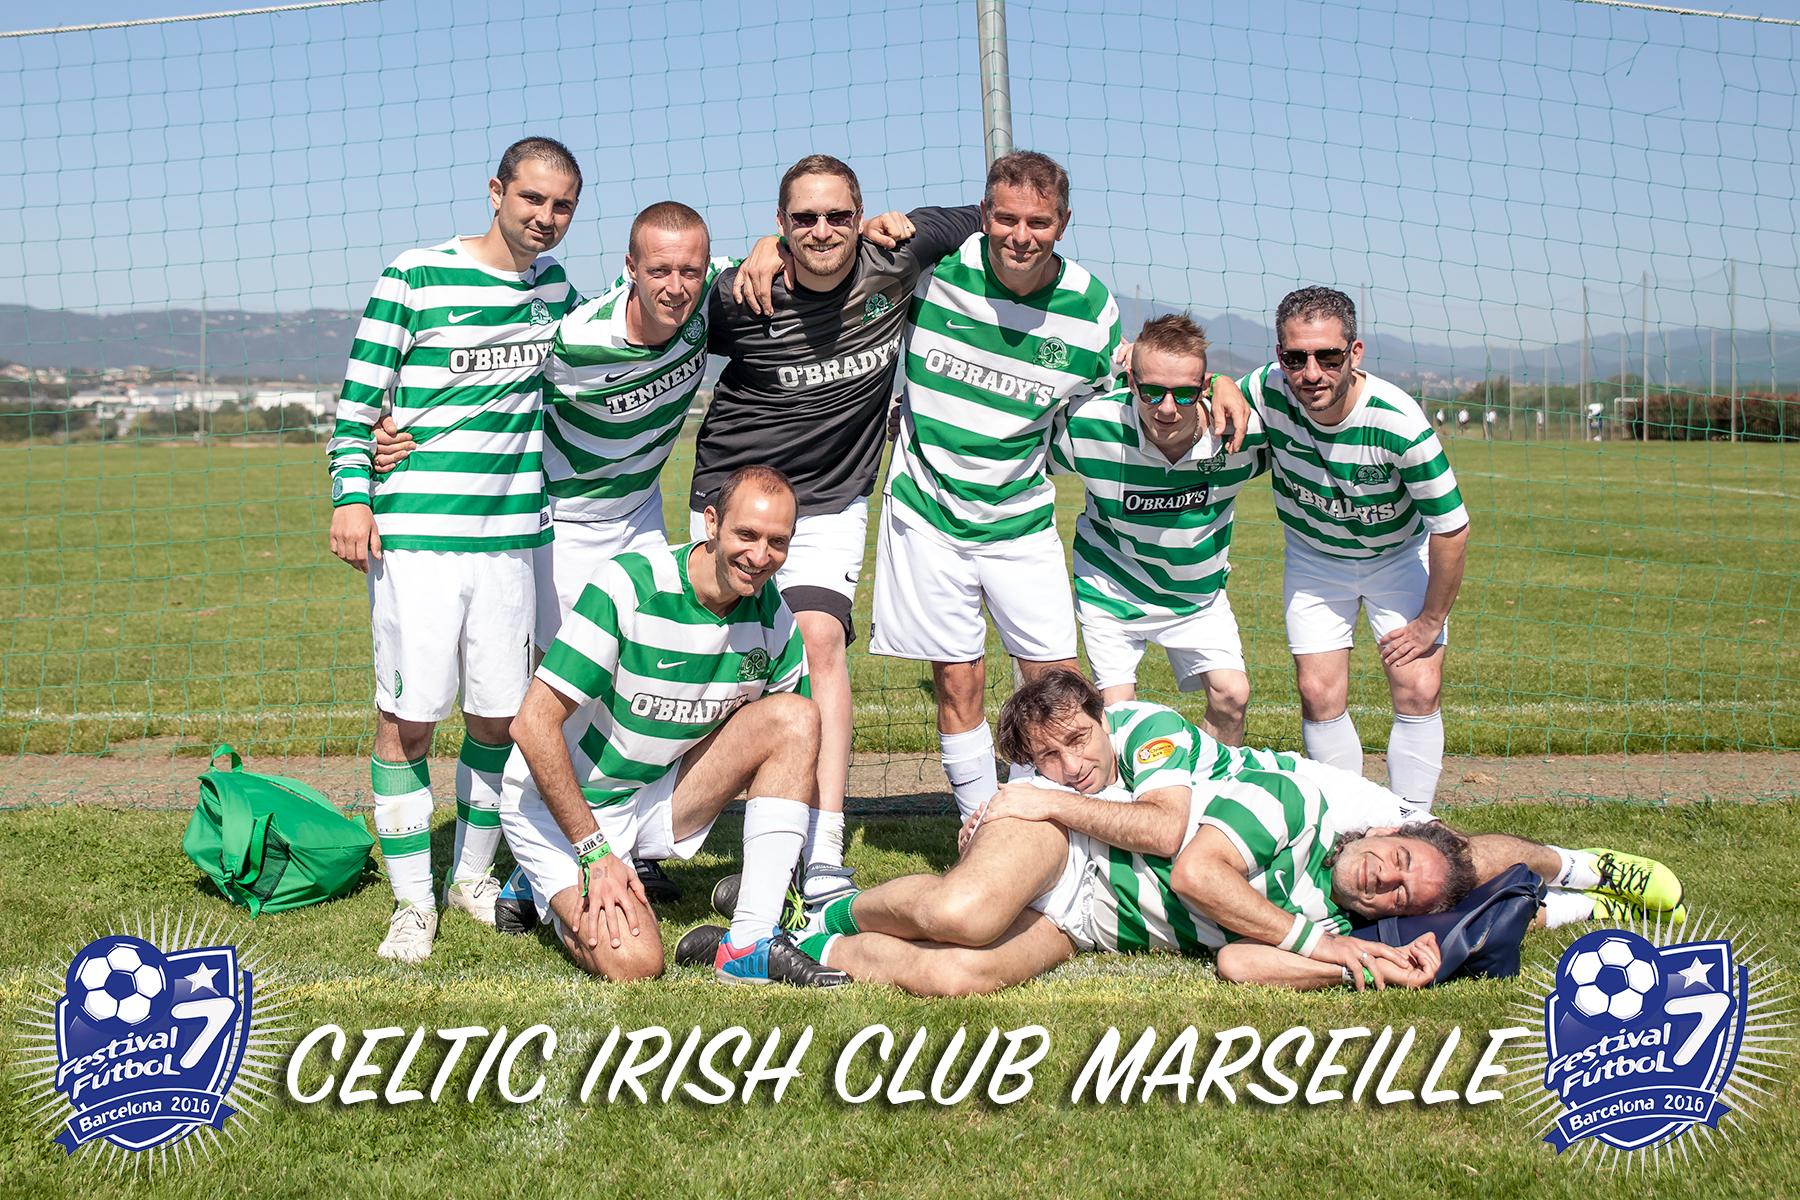 CELTIC IRISH CLUB MARSEILLE